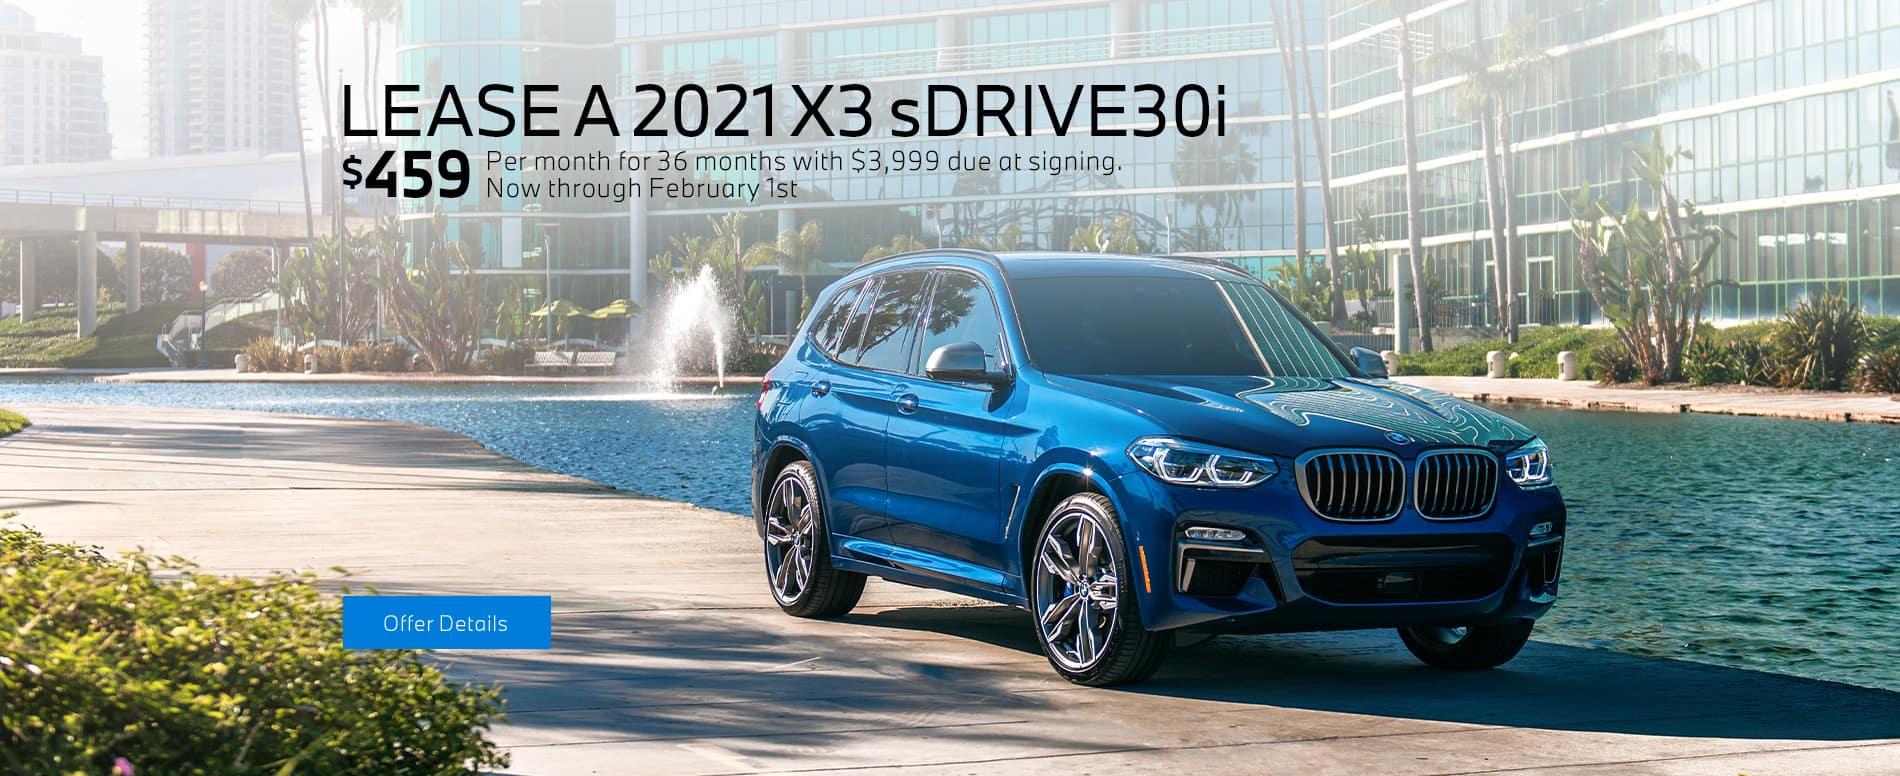 LEASE A 2021 BMW X3 sDRIVE30i